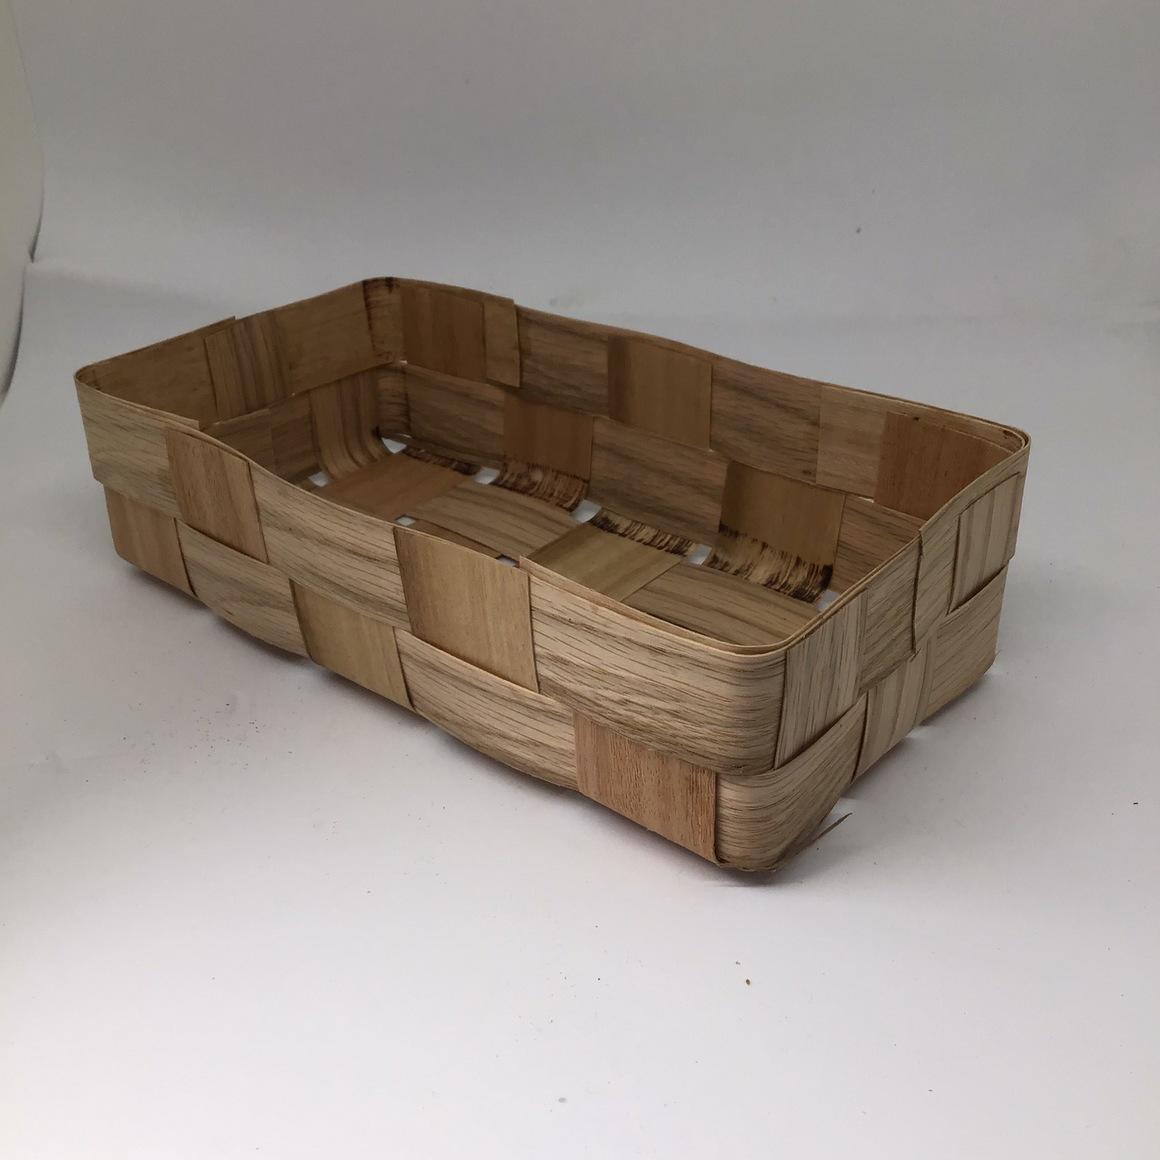 Double Hamper (10x20x6cm) woven veneer box, hamper, basket, gift box | Trada Marketplace